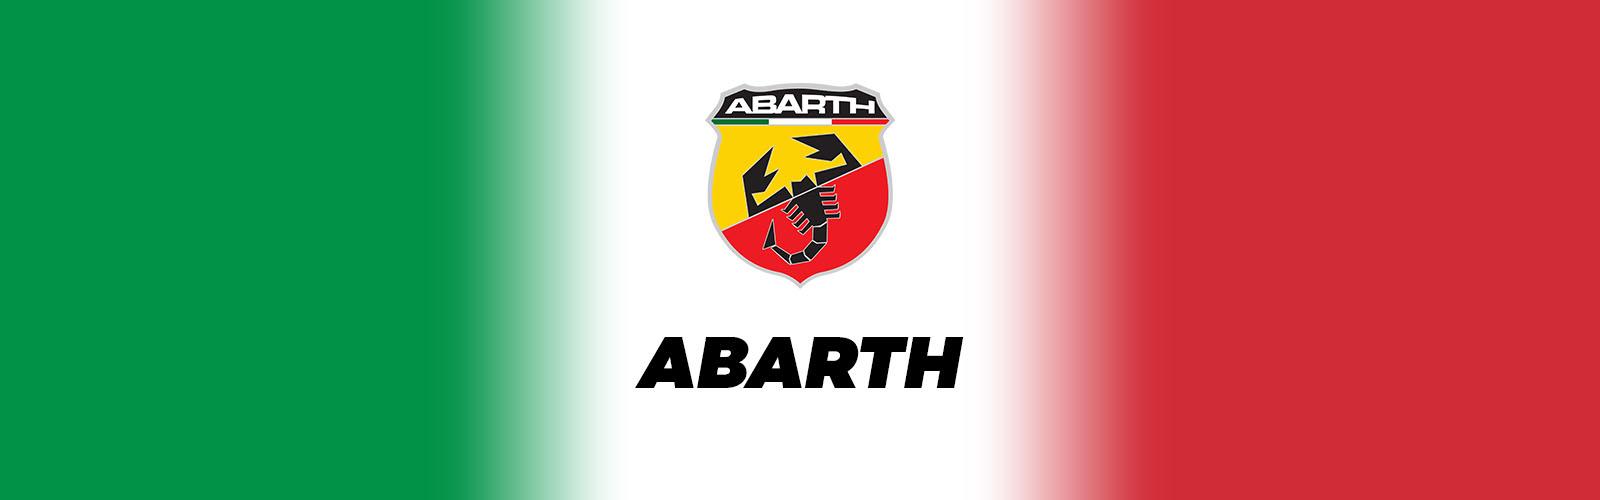 Abarth logo marque